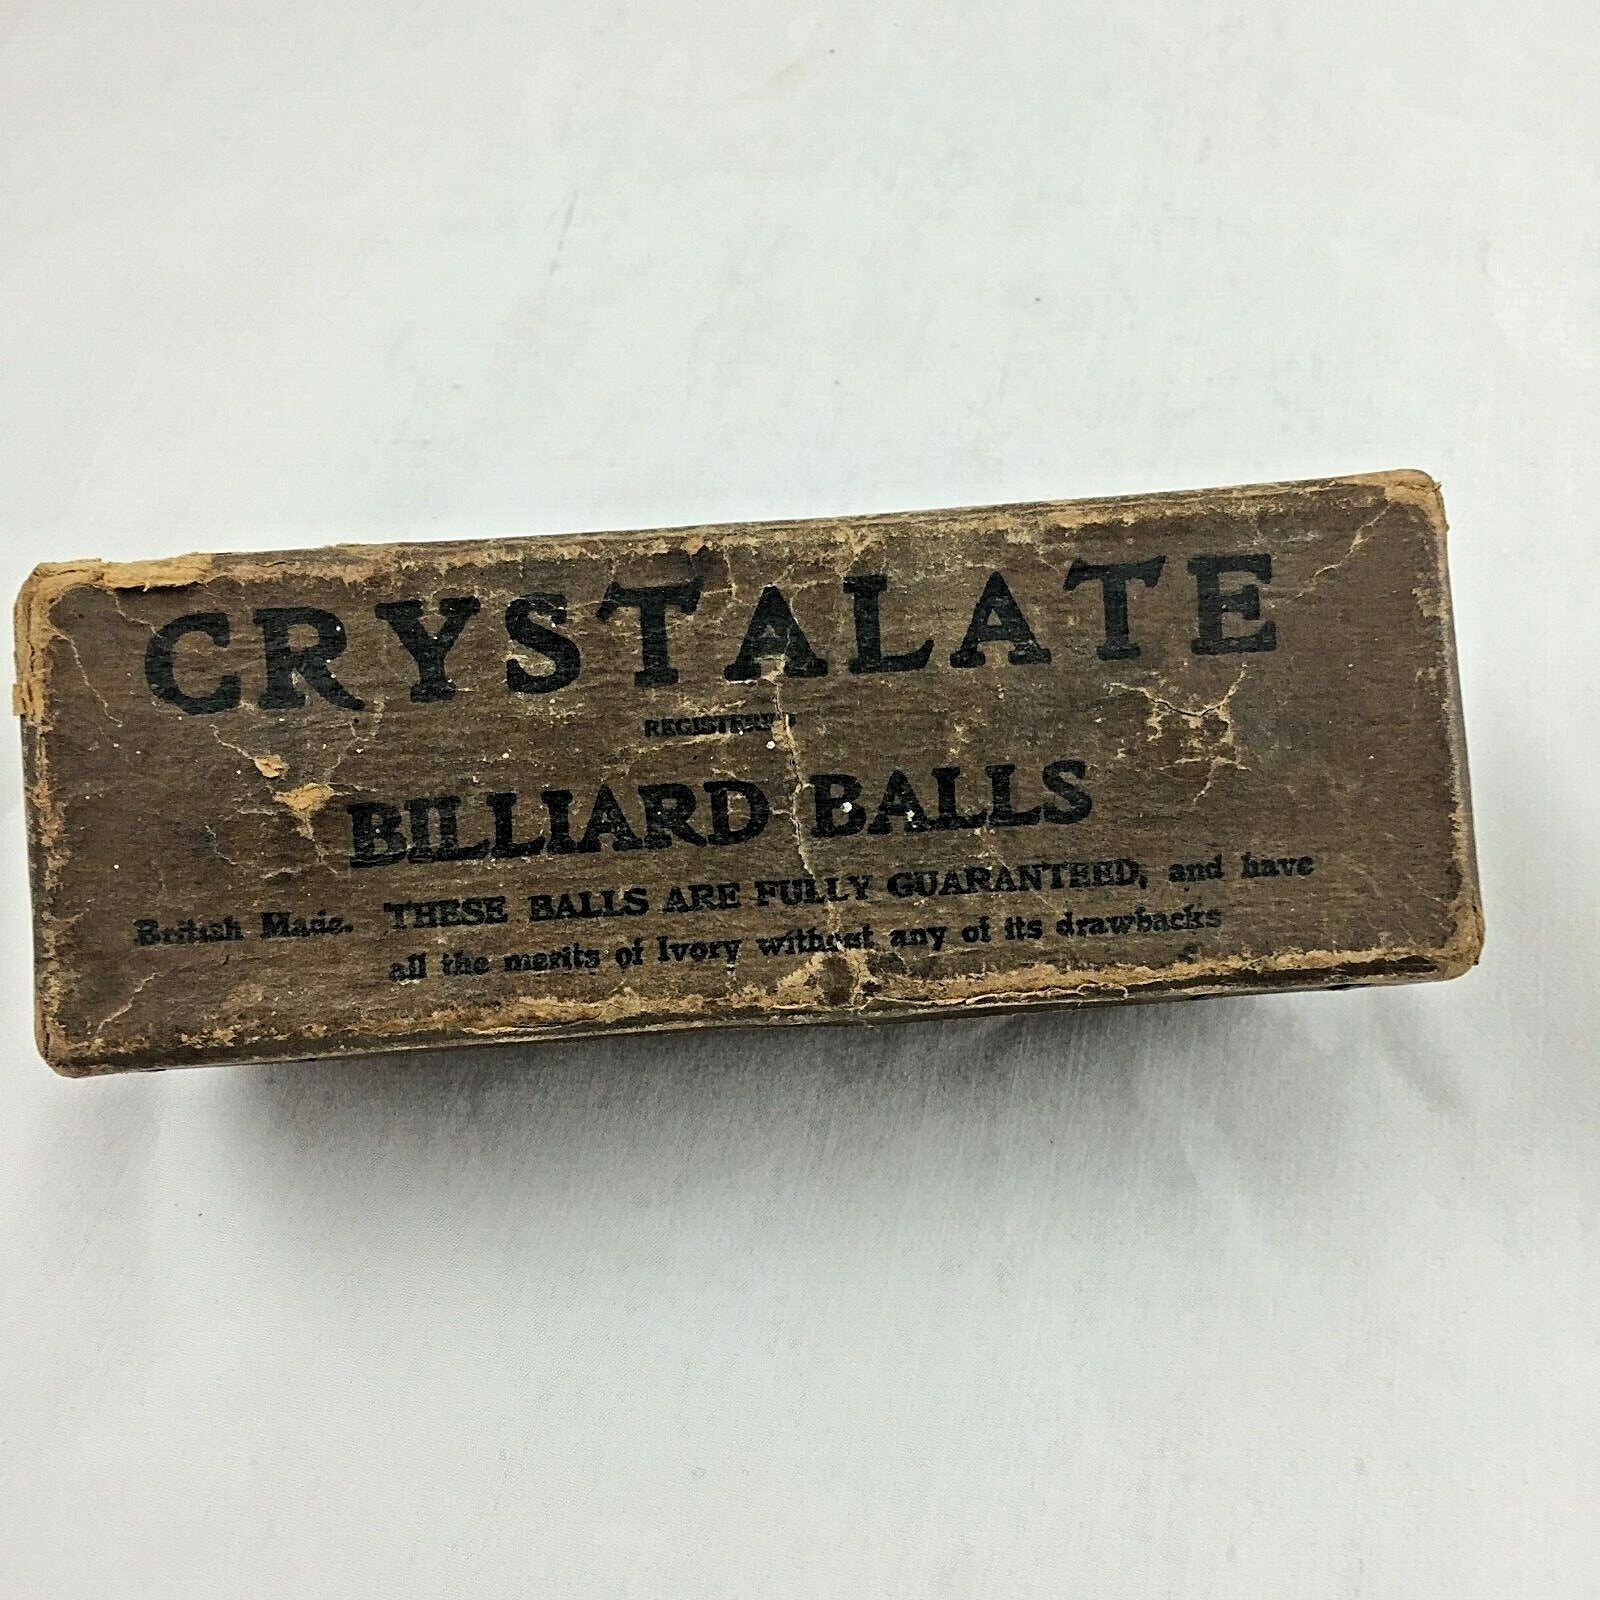 Vintage CRYSTALATE Billiard Balls ~ Original Box -